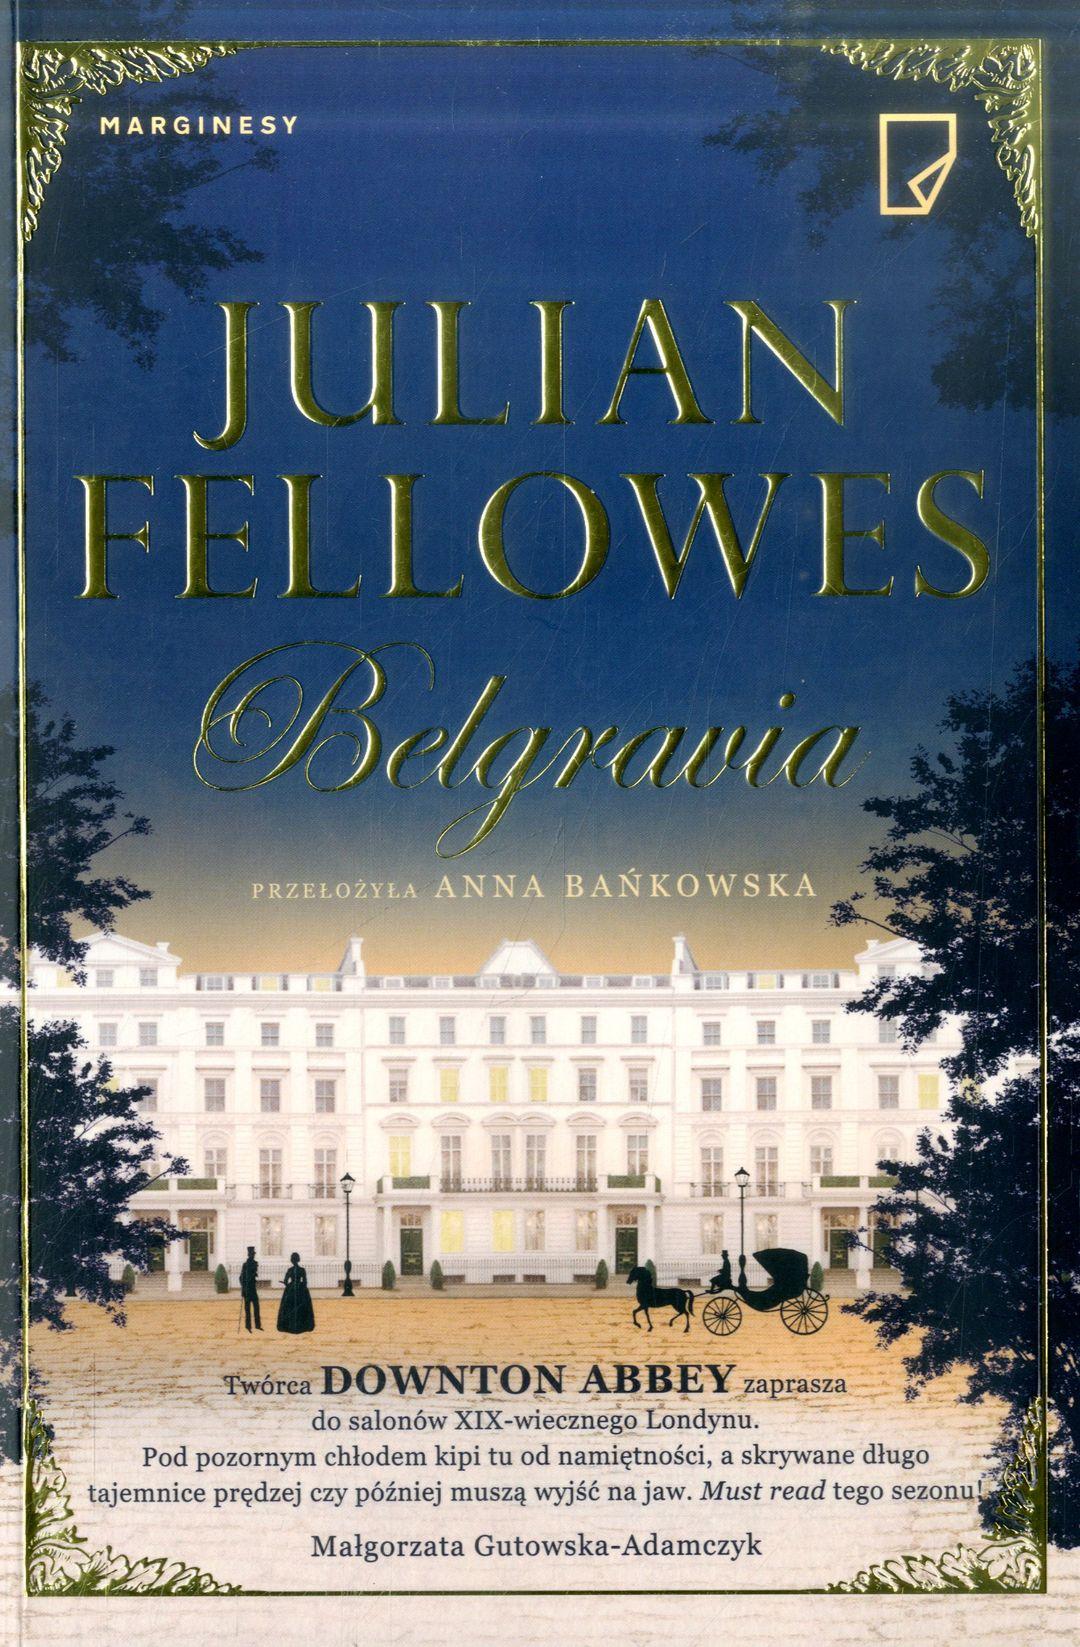 Fellowes Julian - Belgravia